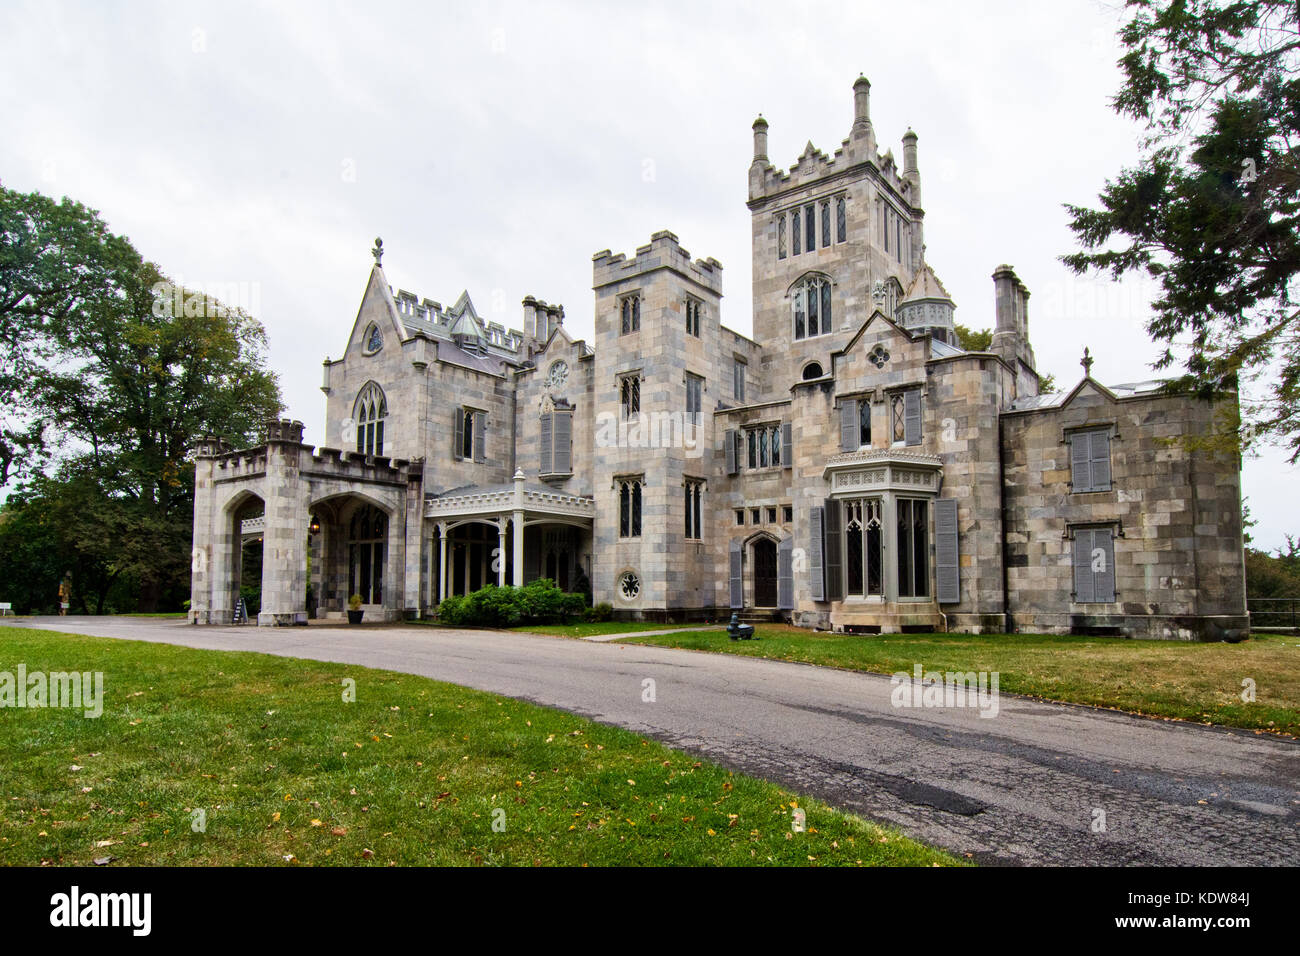 The Gothic Architecture Of Historic Lyndhurst Mansion On Banks Hudson River Tarrytown New York USA